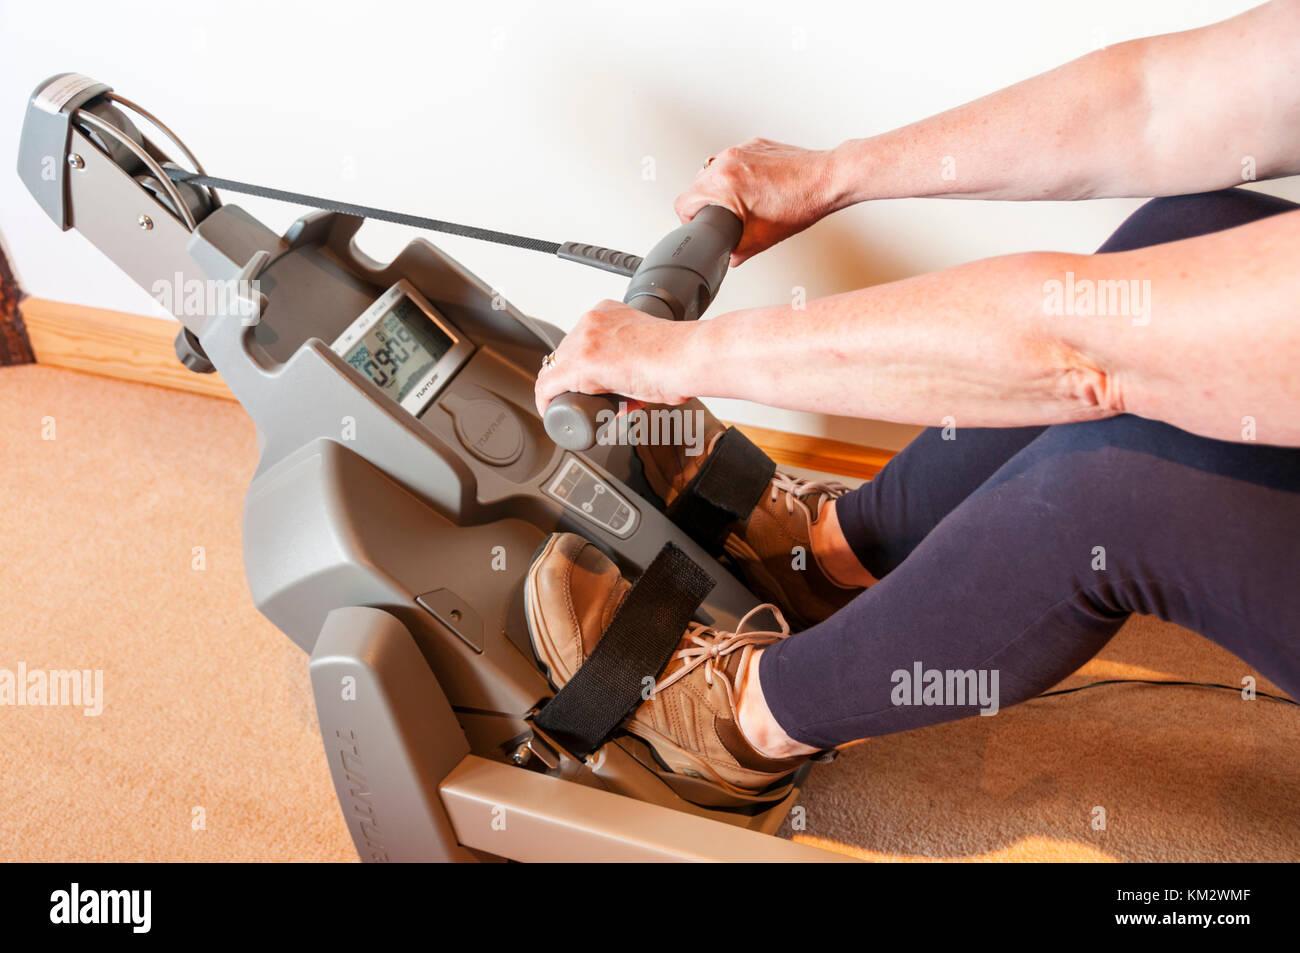 Femme à l'aide d'une machine d'exercice tunturi accueil. Photo Stock